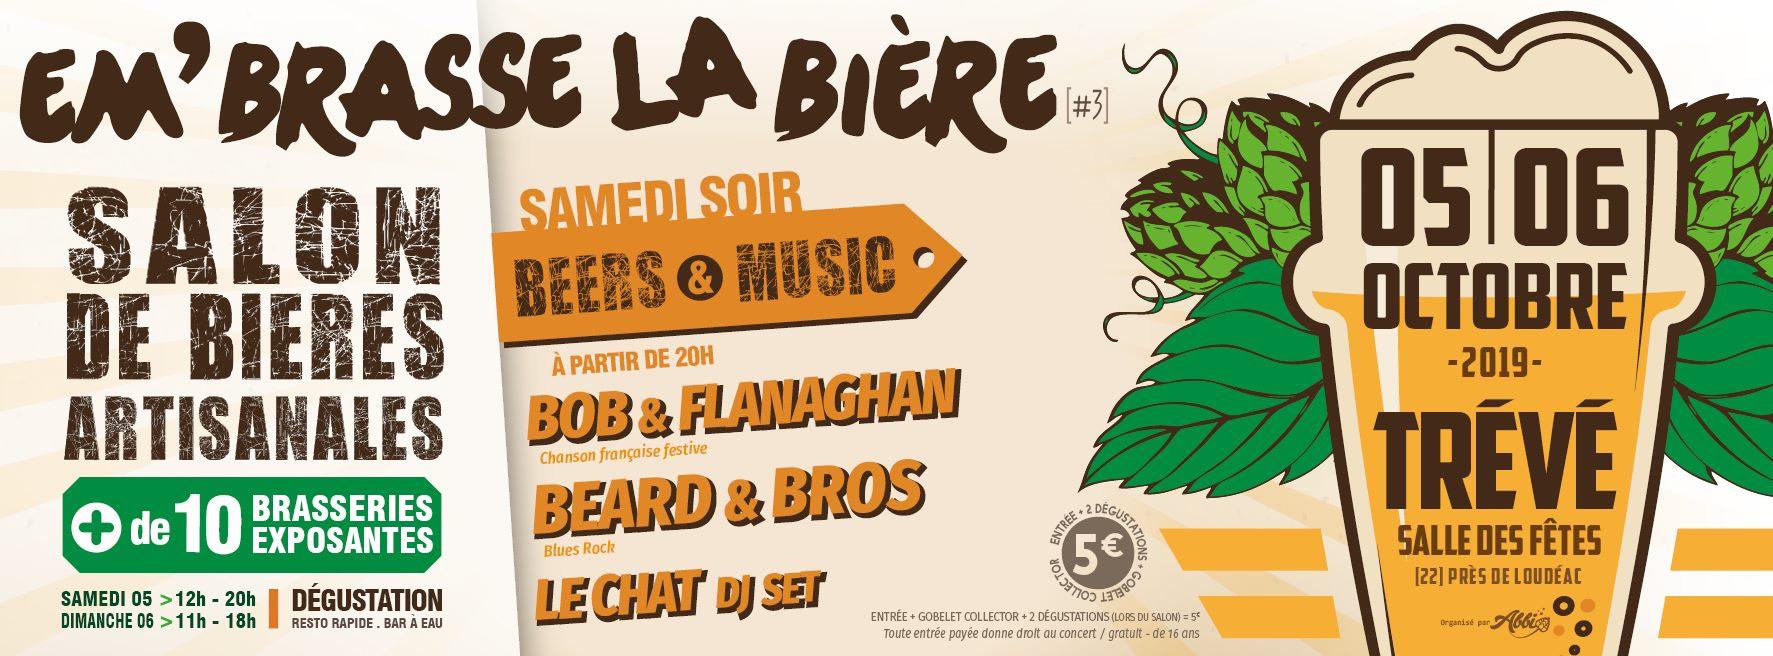 Salon Embrasse La Biere Treve Loudeac 02